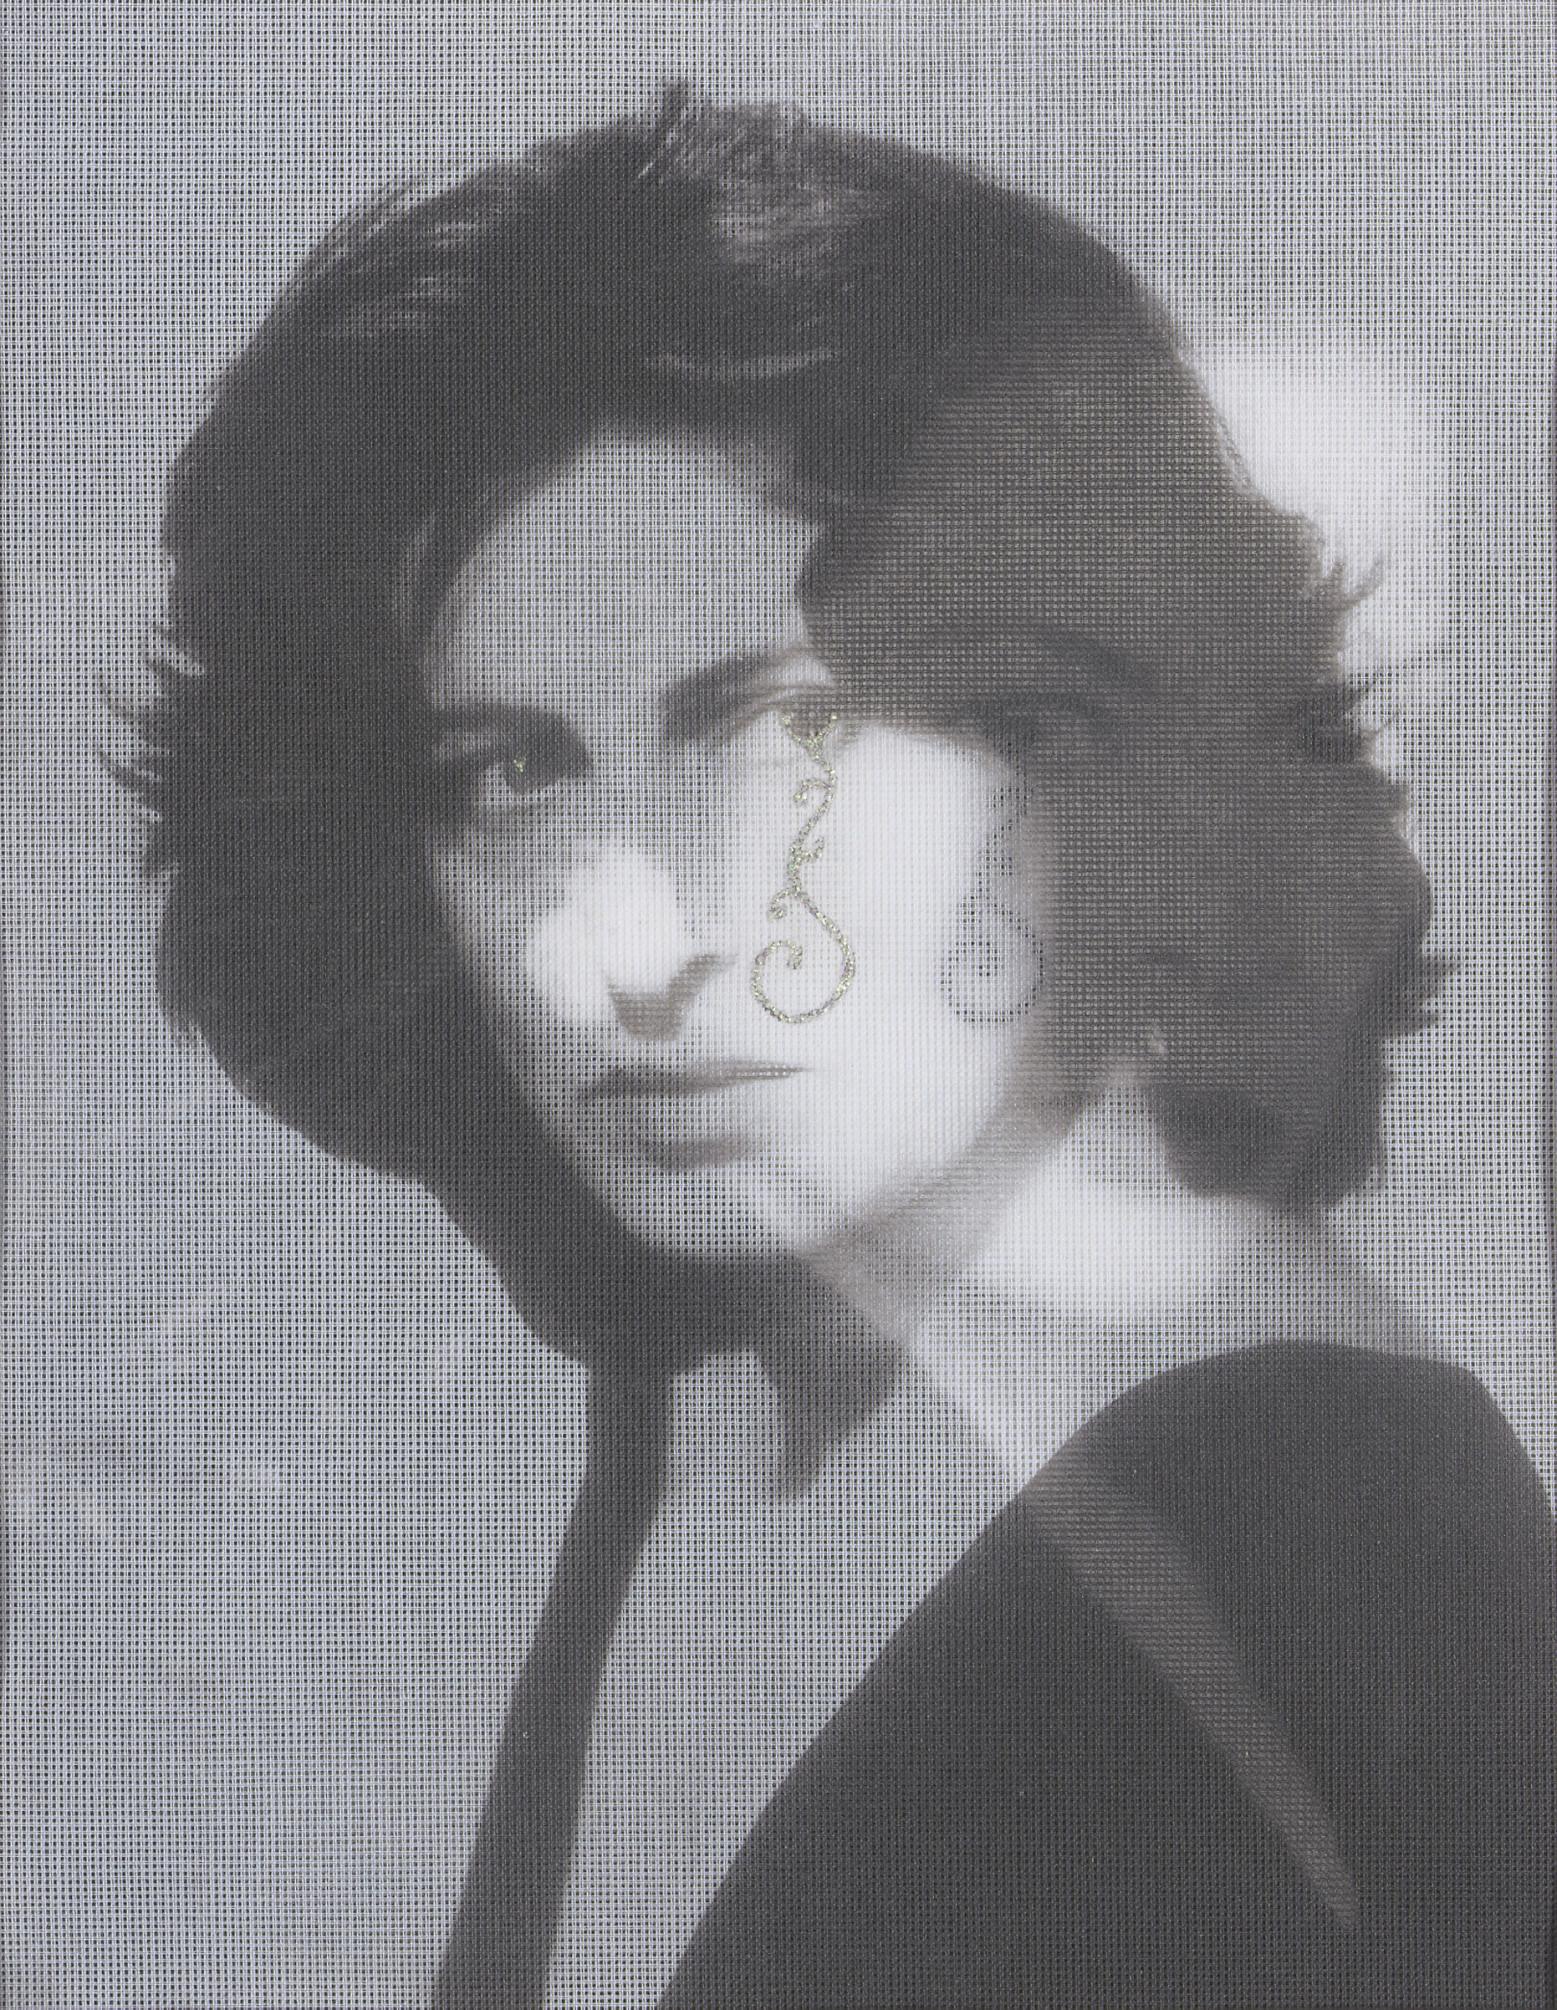 Francesco Vezzoli (N. 1971)